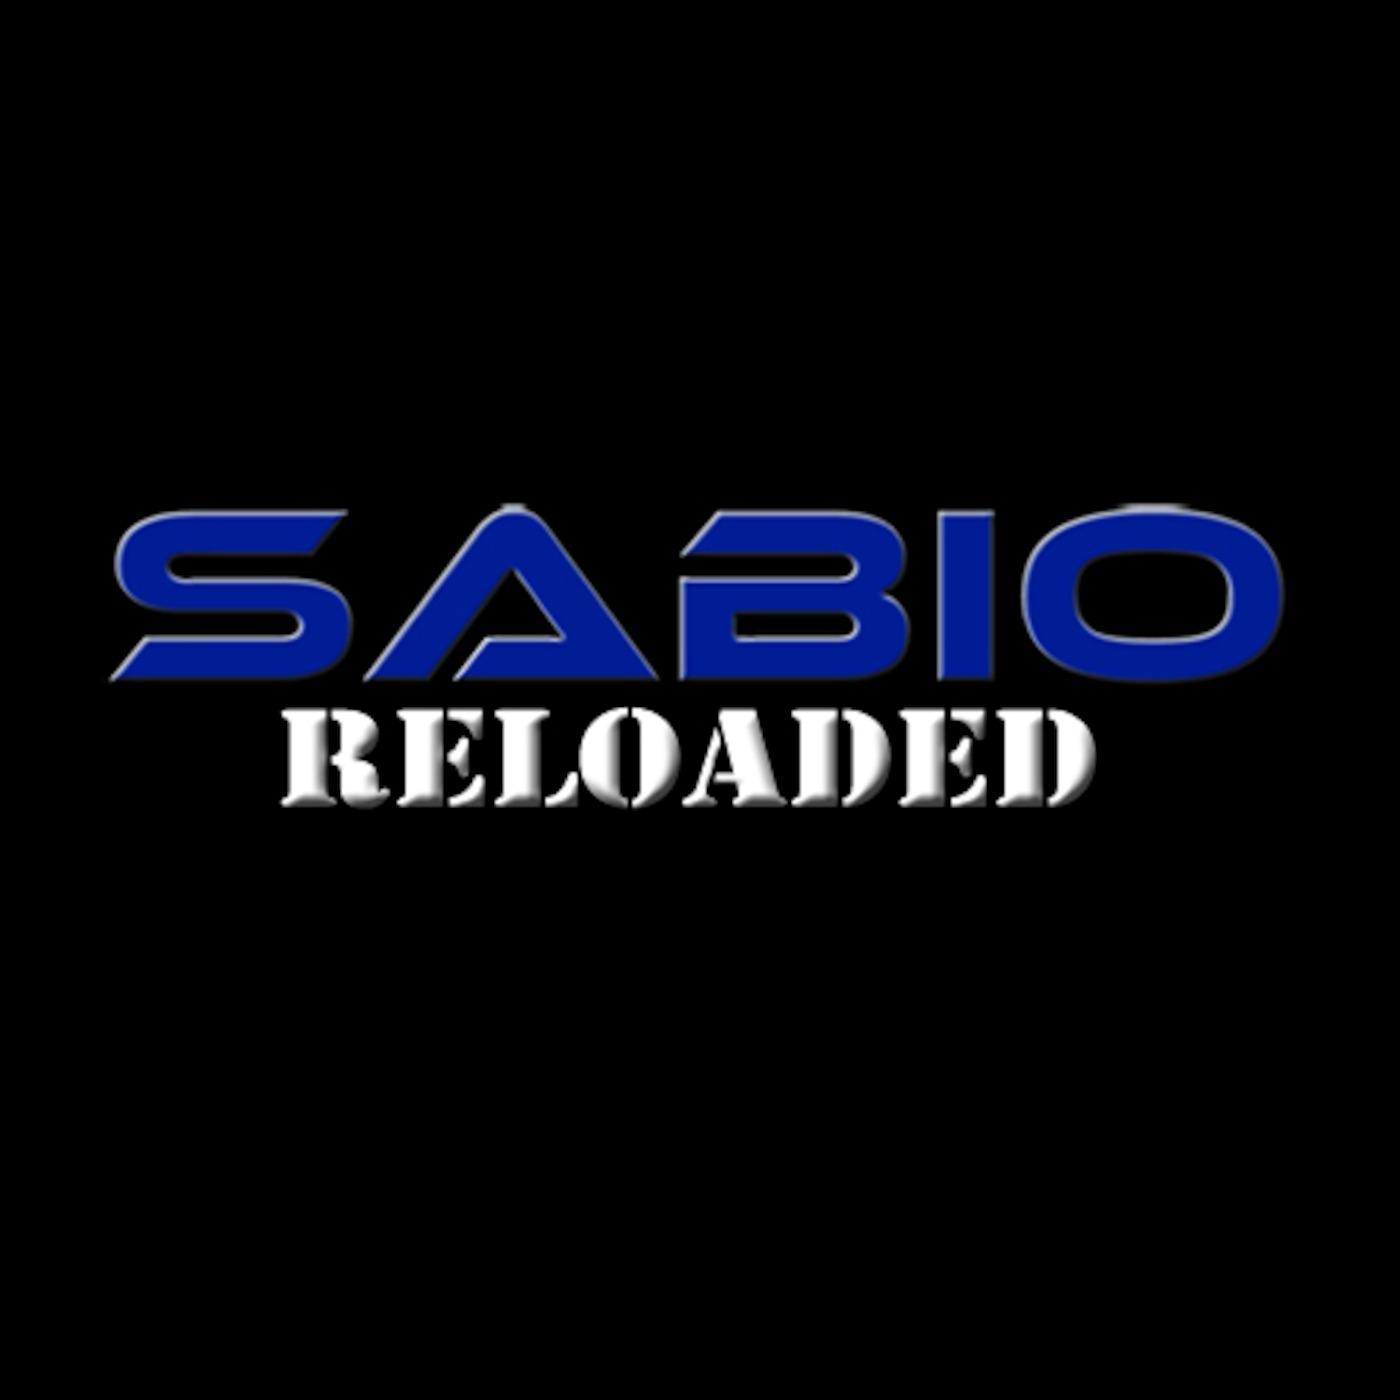 SABIO RELOADED